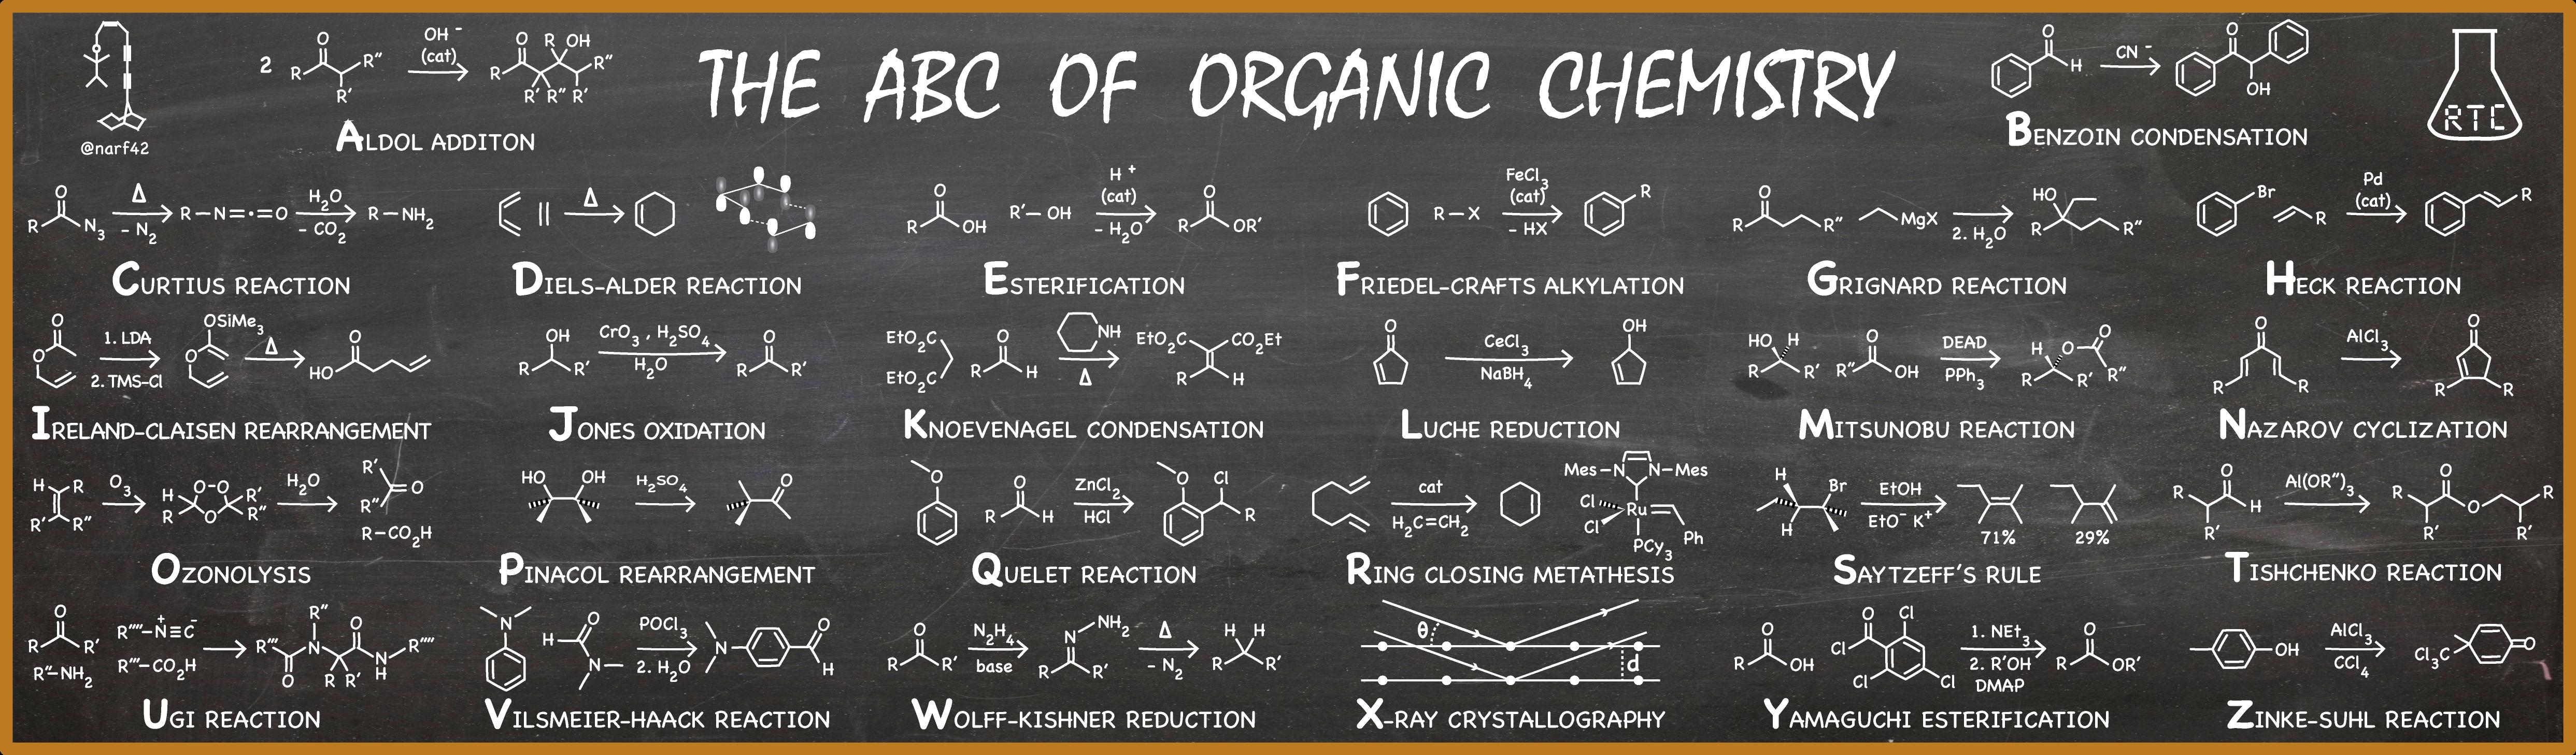 The ABC of organic chemistry | The Hitchhiking Postdoc